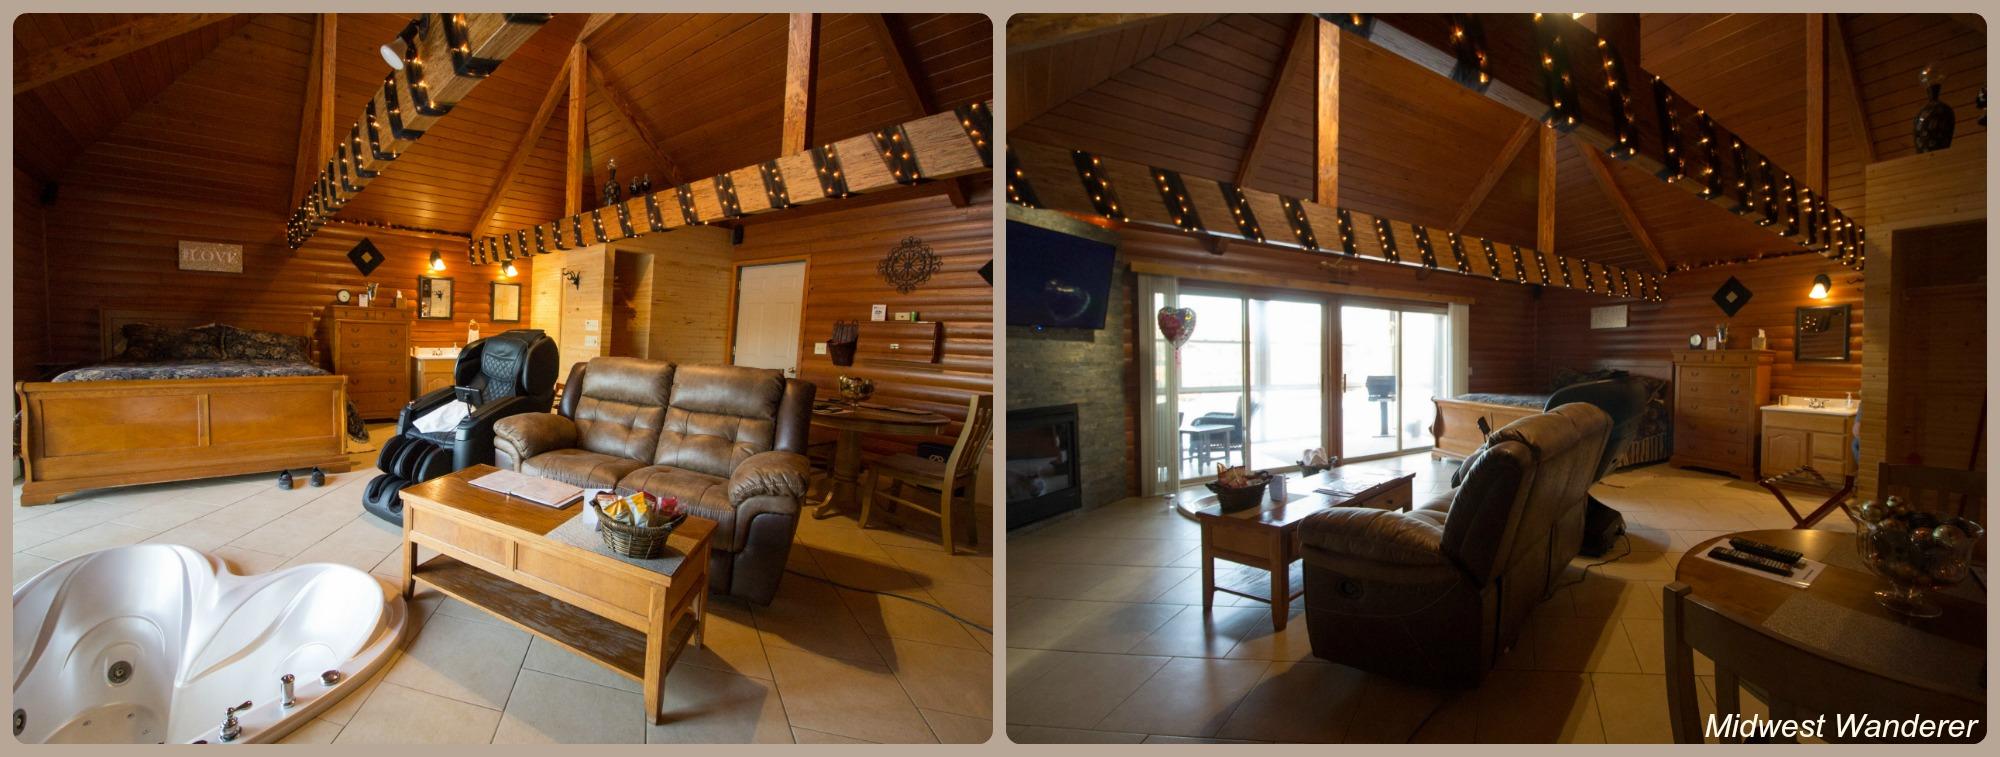 Serenity Springs cabin interior